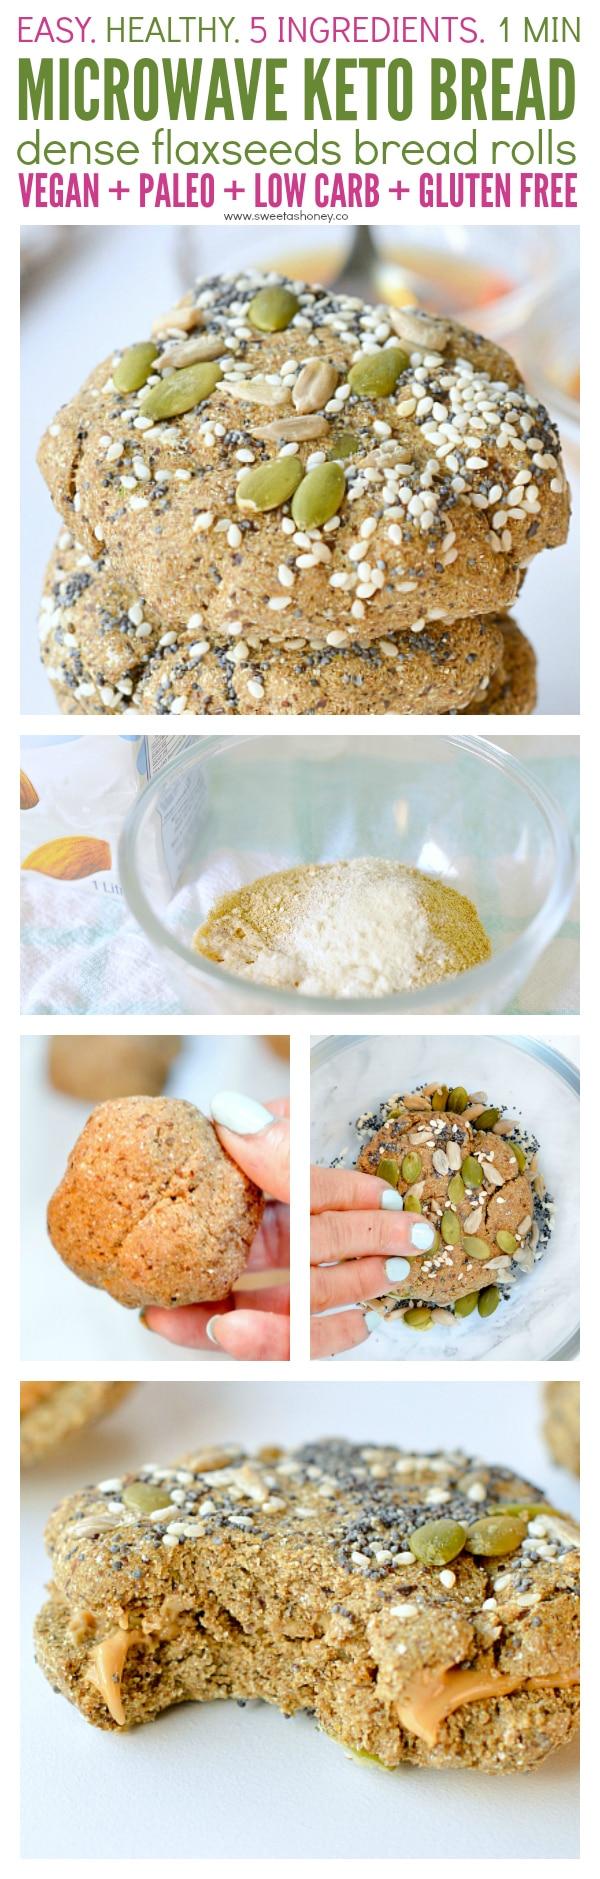 Microwave keto bread easy